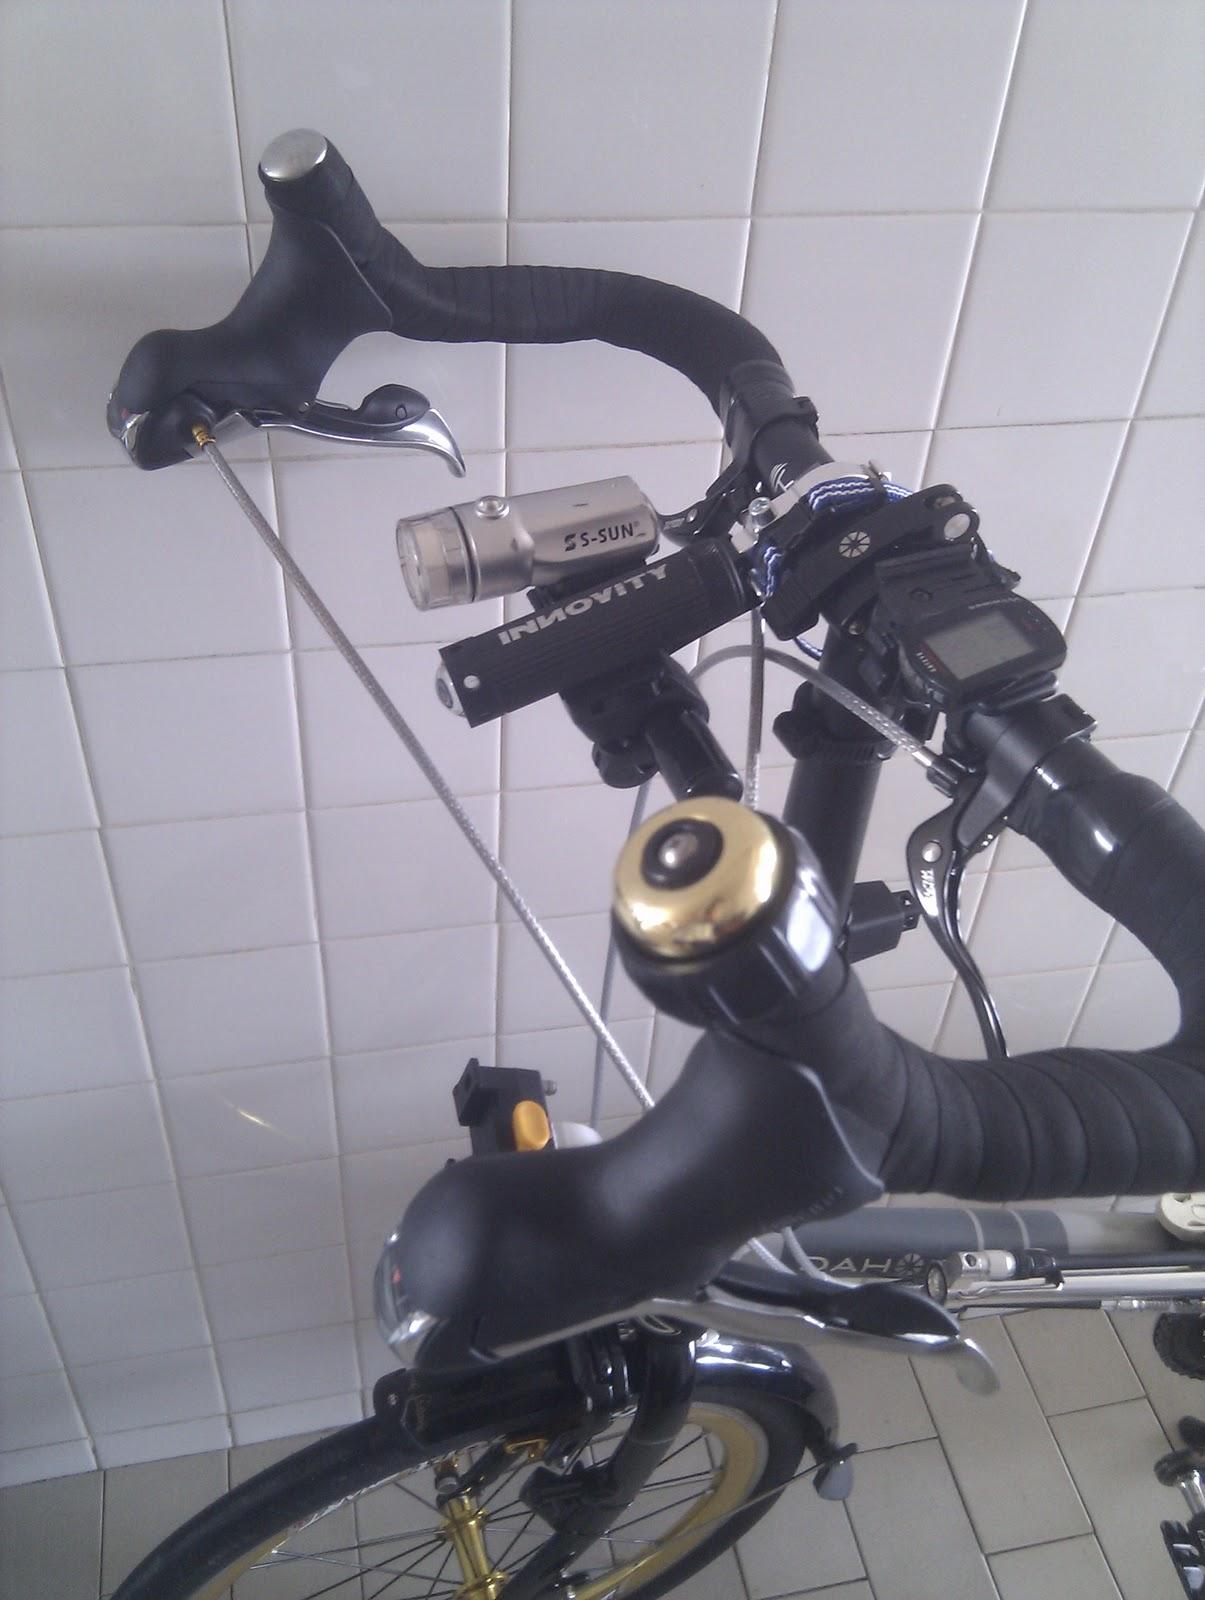 Hands On Bike Minoura Space Grip Sgl 300 Review